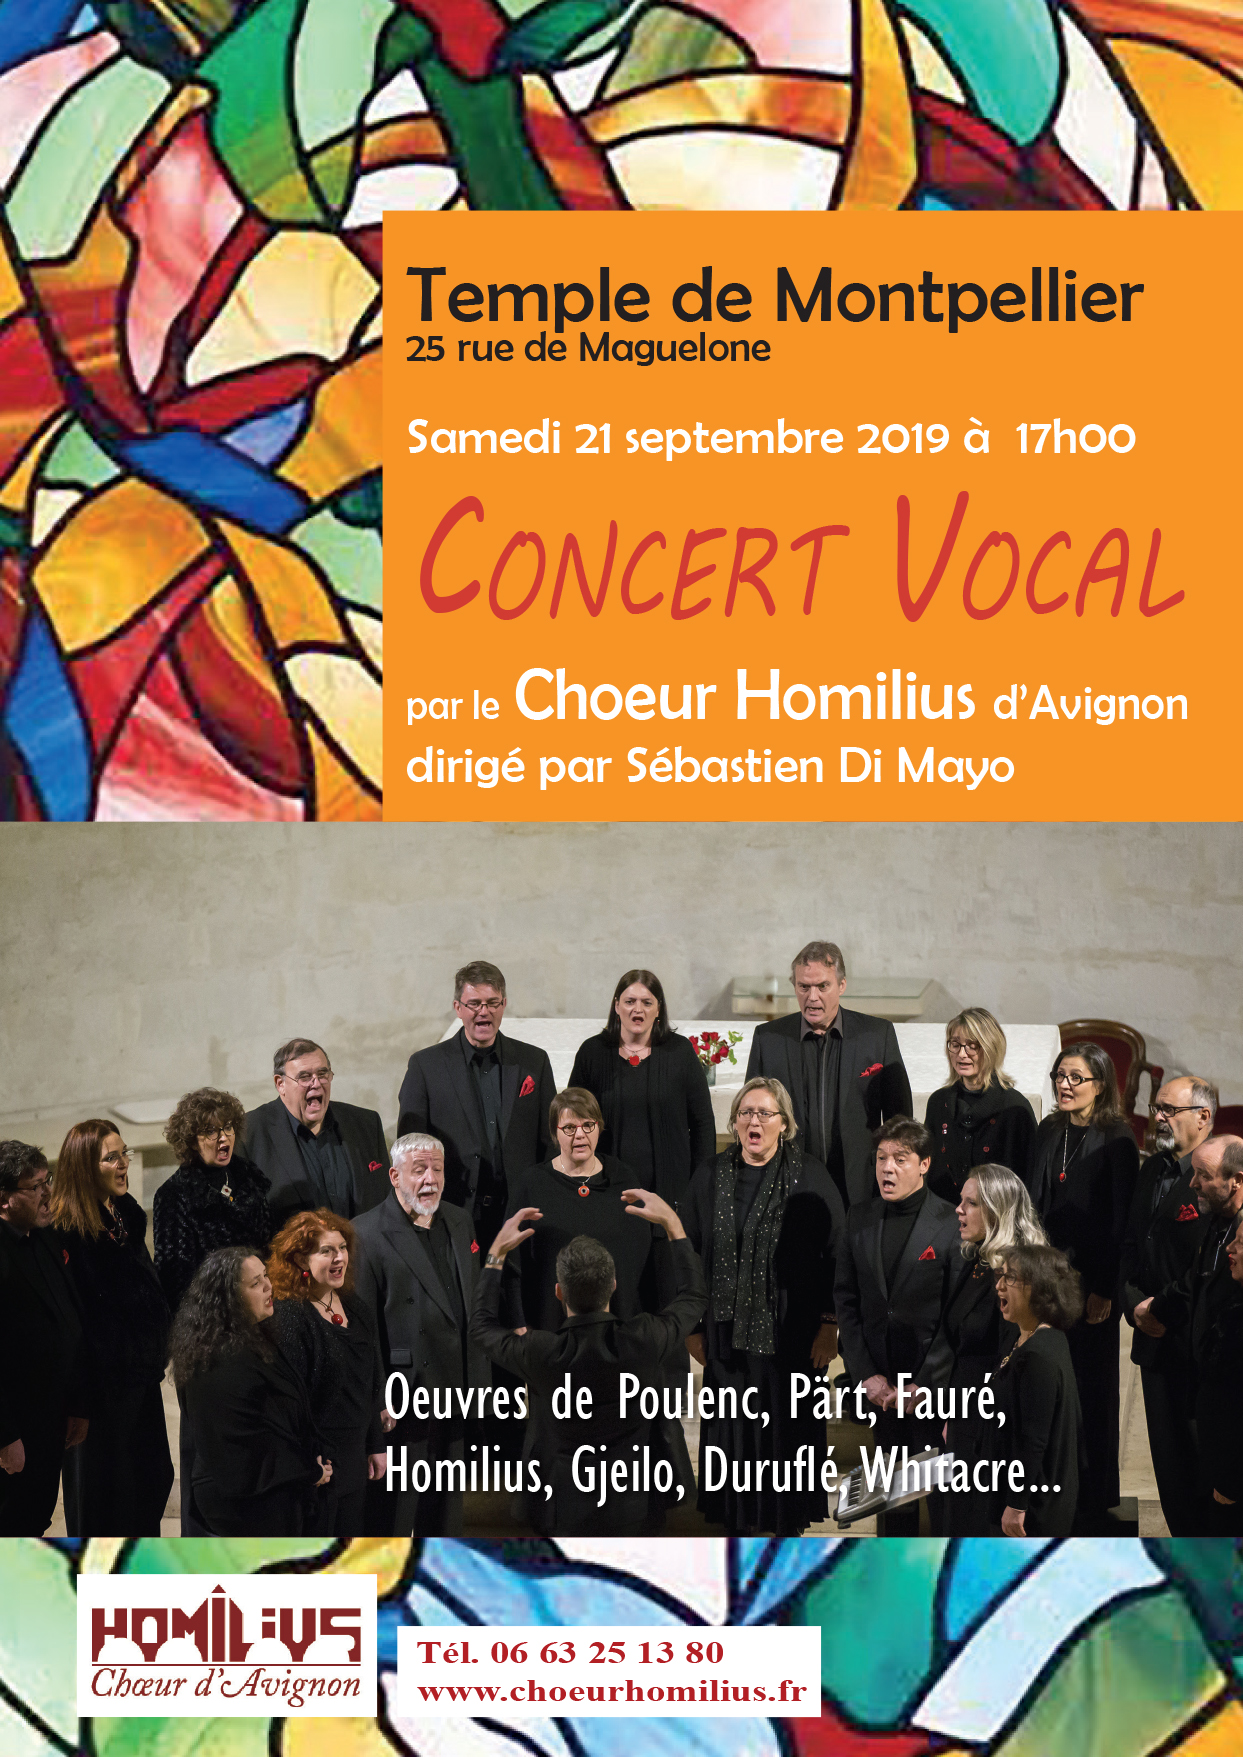 20190921 temple montpellier